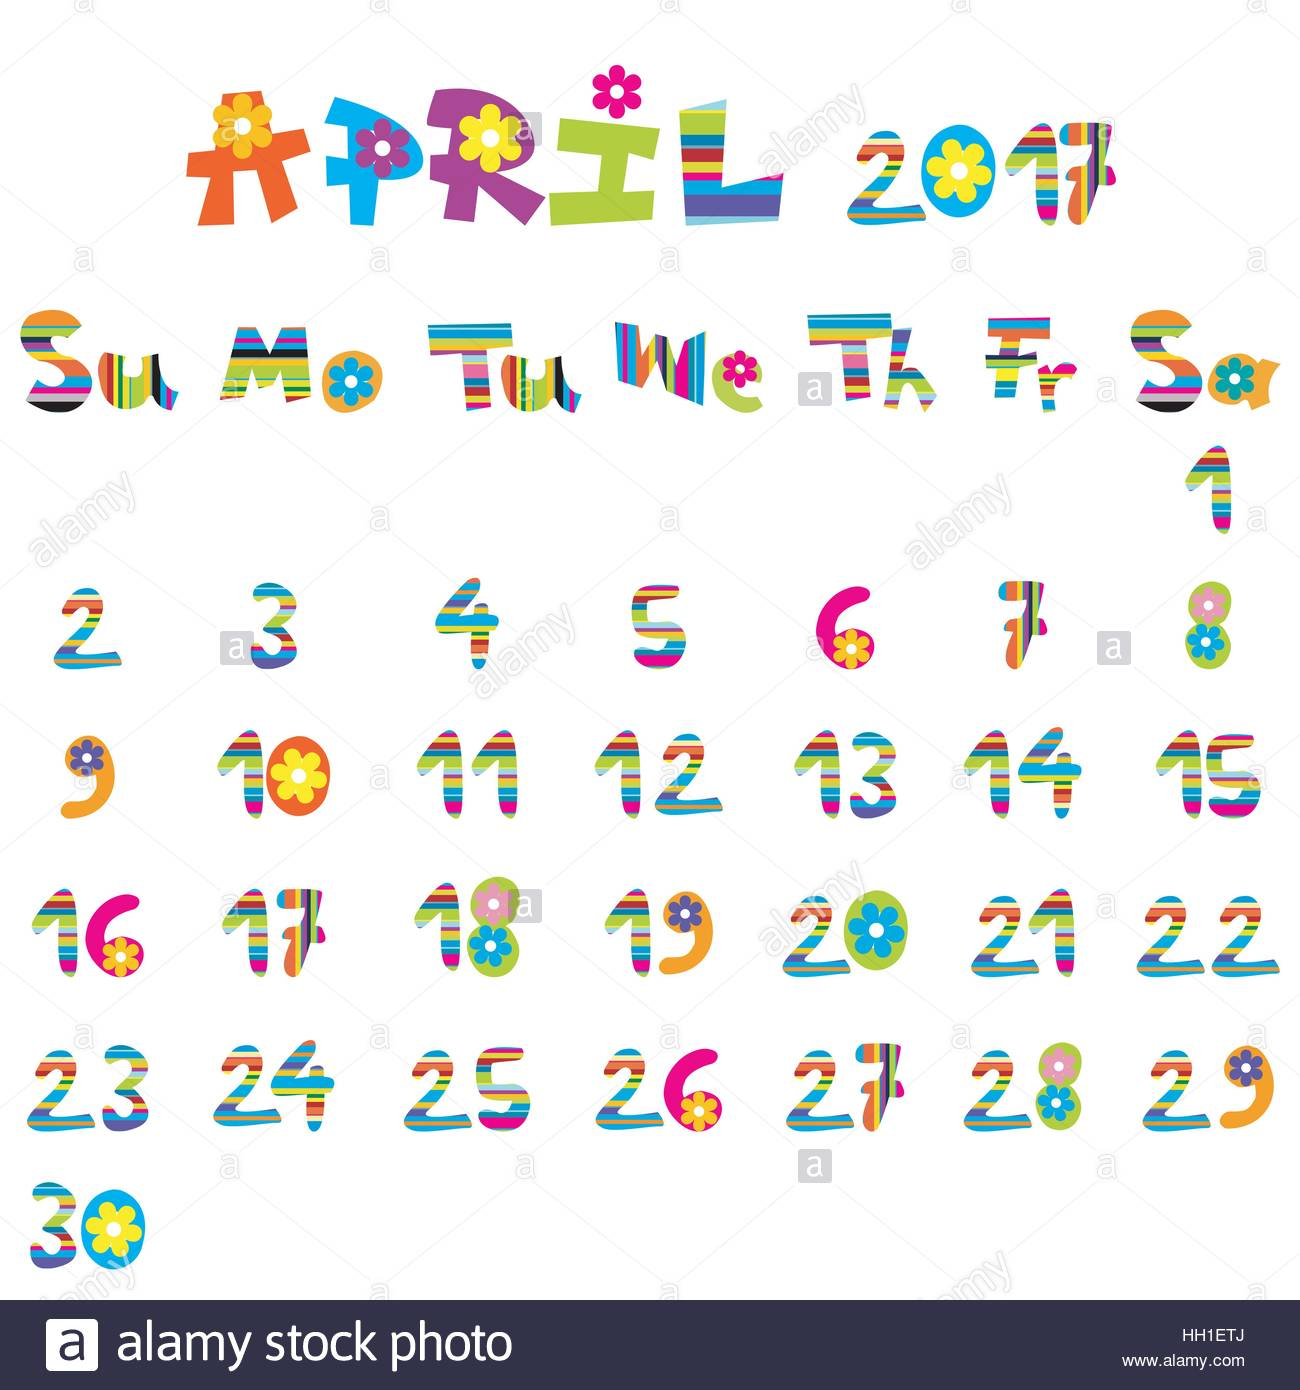 cute april 2017 calendar for kids stock vector art illustration